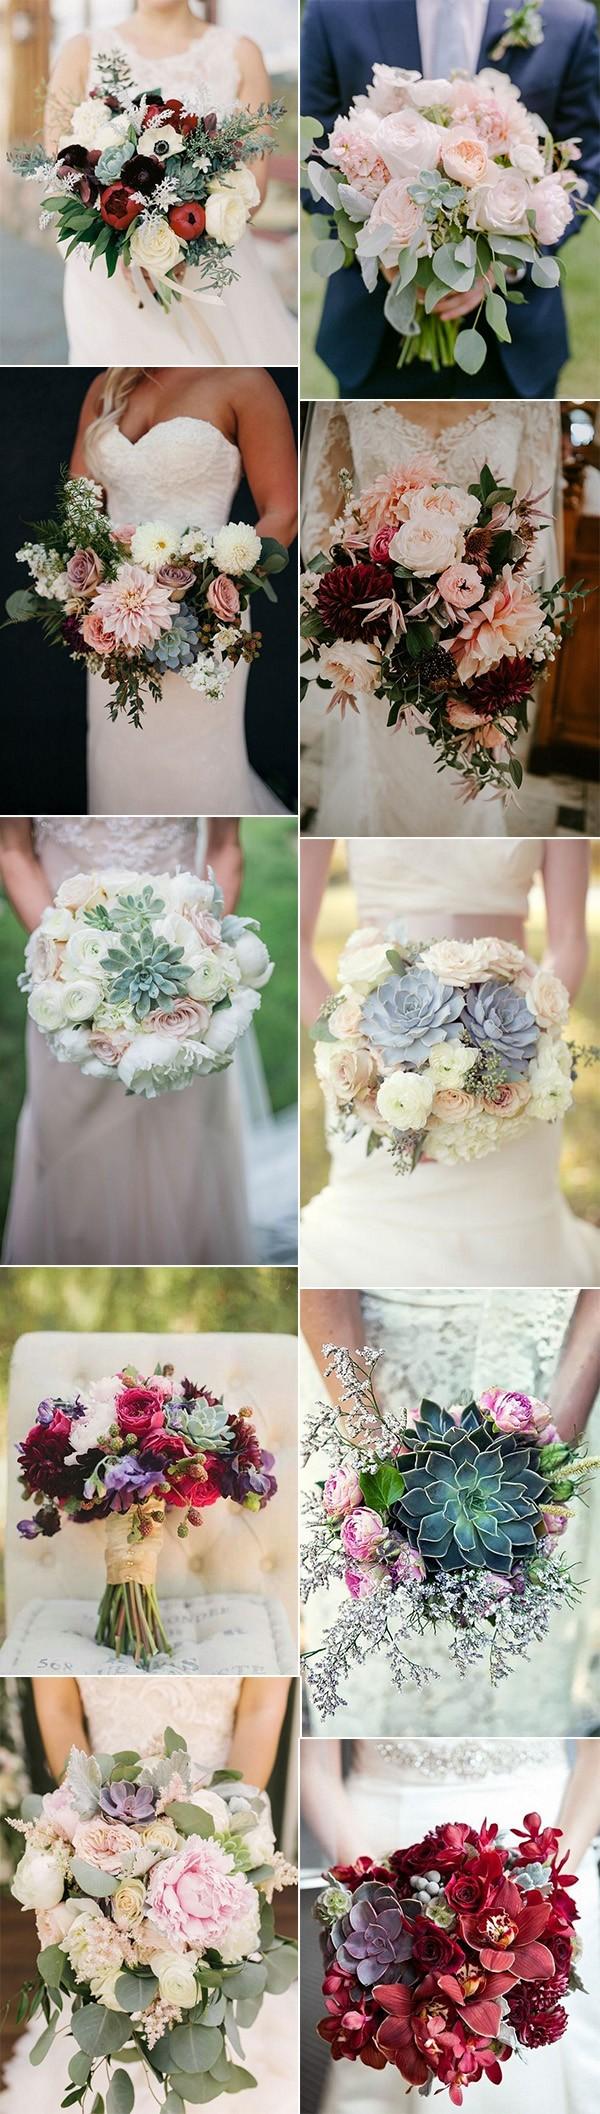 2018 trending succulents wedding bouquet ideas